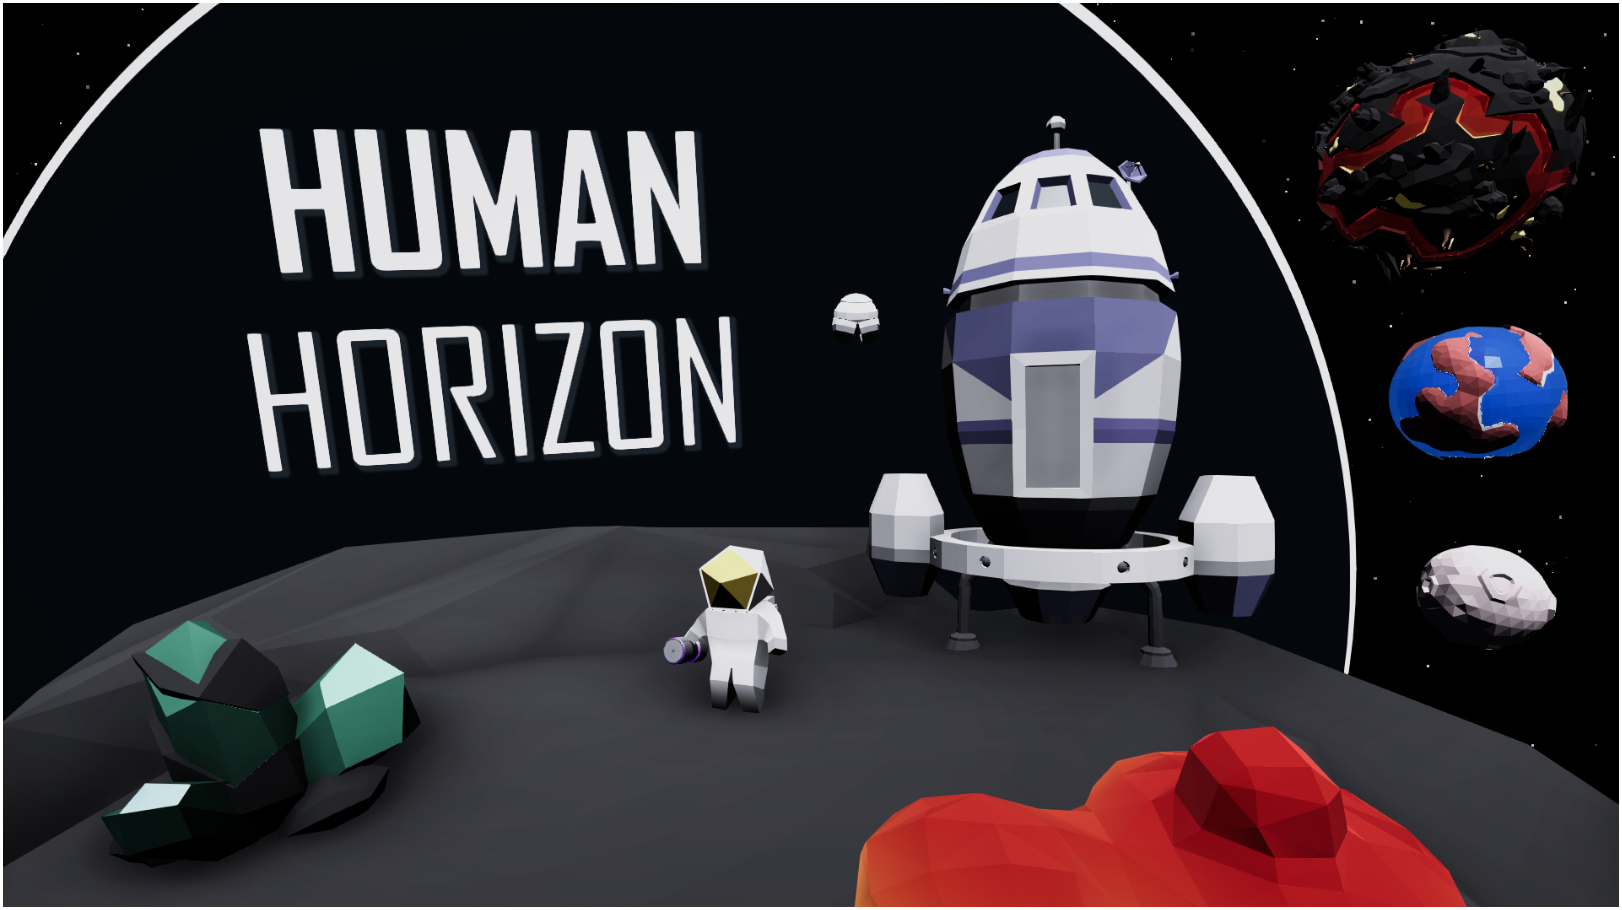 Human Horizon